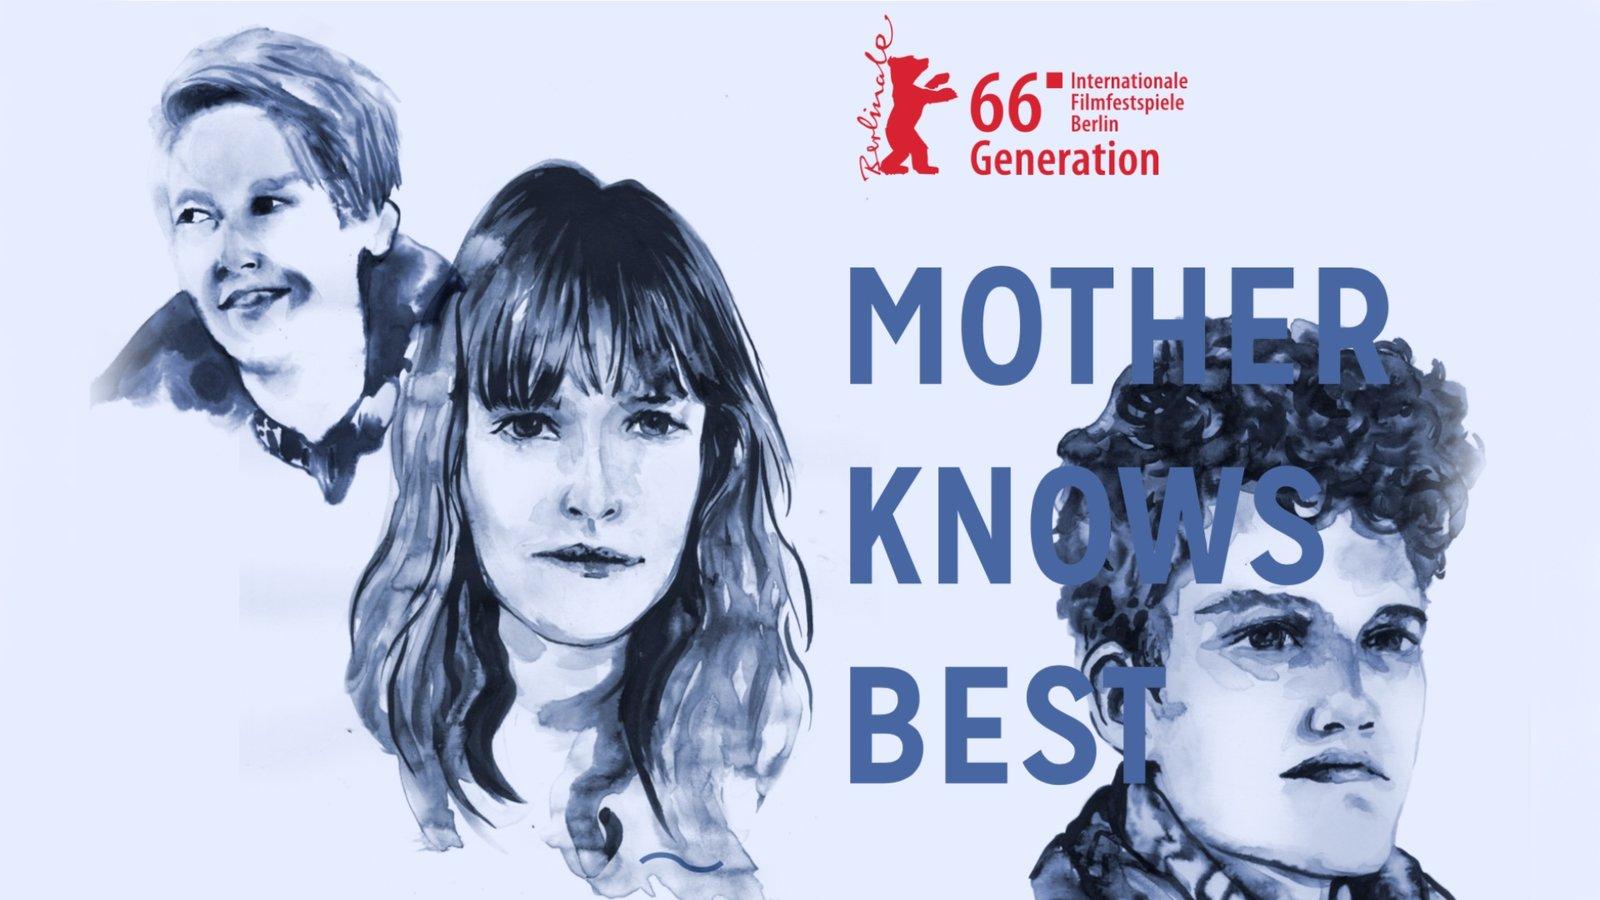 Mother Knows Best - Mamma Vet Bäst